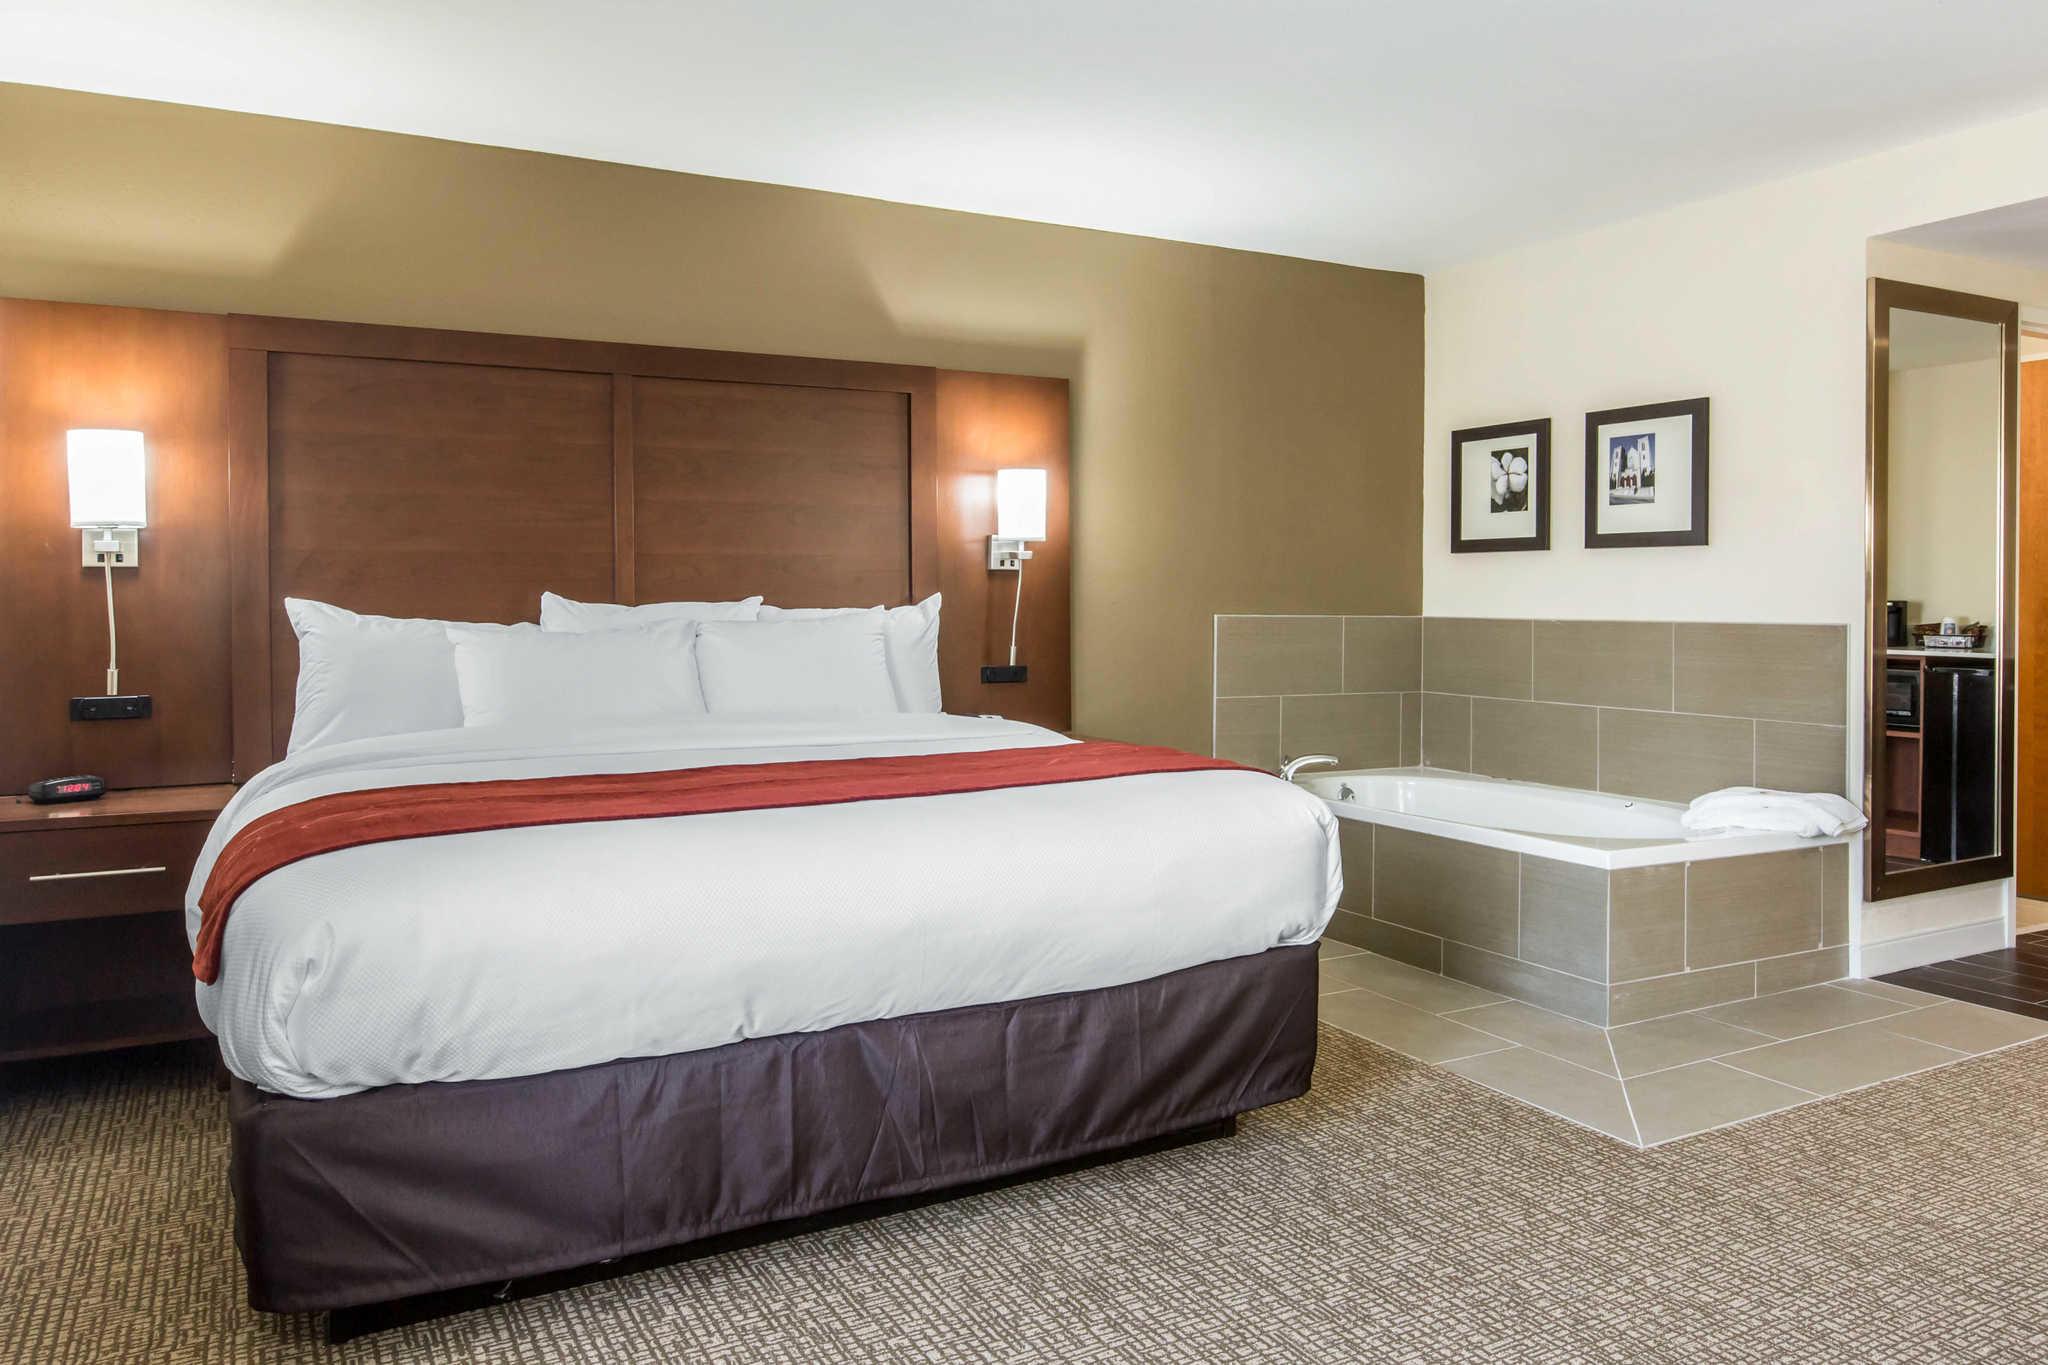 Comfort Inn & Suites West image 13